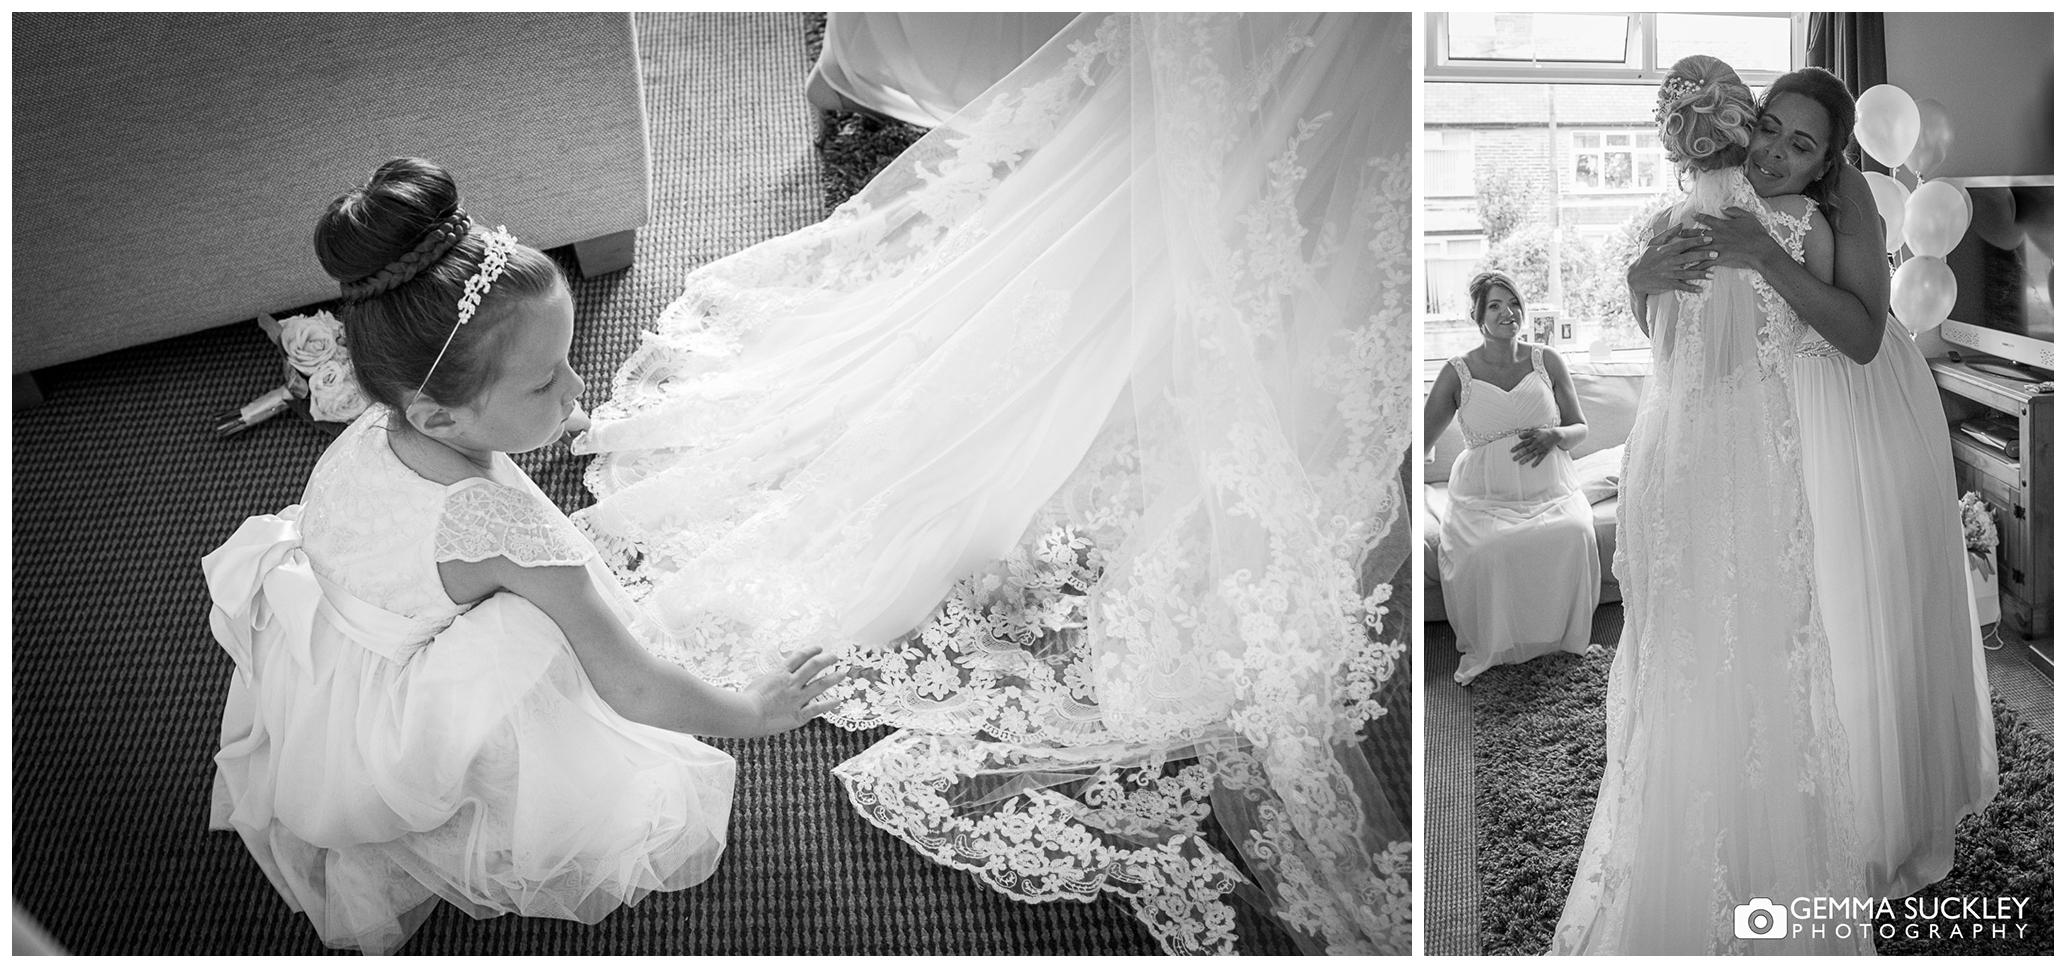 bridal-prepartion-in-clayton-bradford.jpg